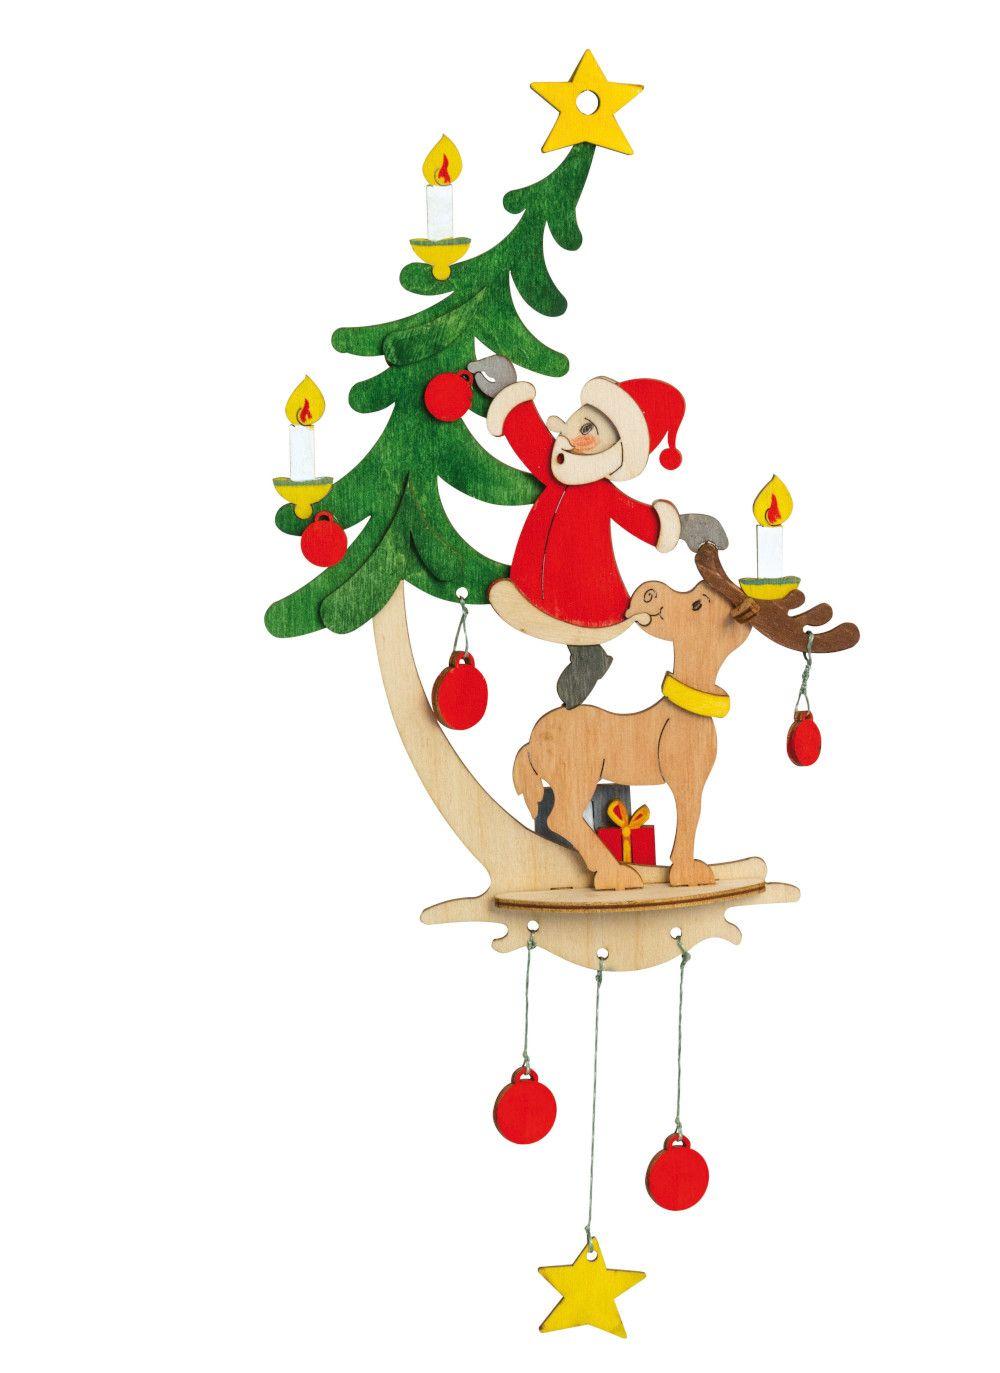 fensterbild weihnachtsmann mit elch 3d holz bastelset. Black Bedroom Furniture Sets. Home Design Ideas